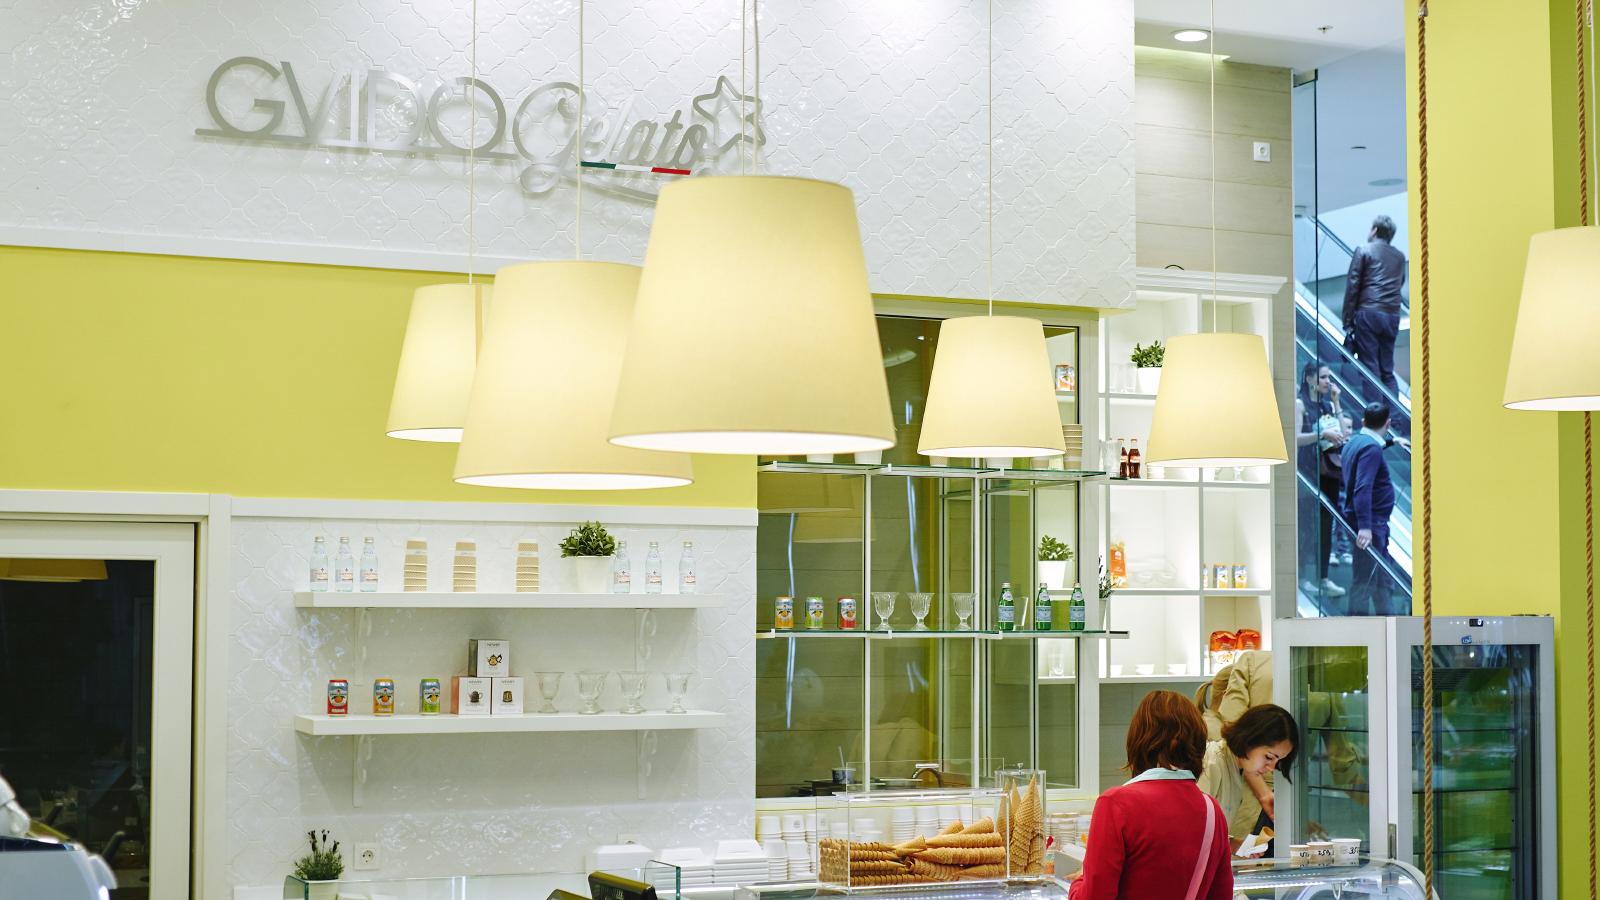 GVIDO GELATO / Branding / 2017 / Russia, Moscow